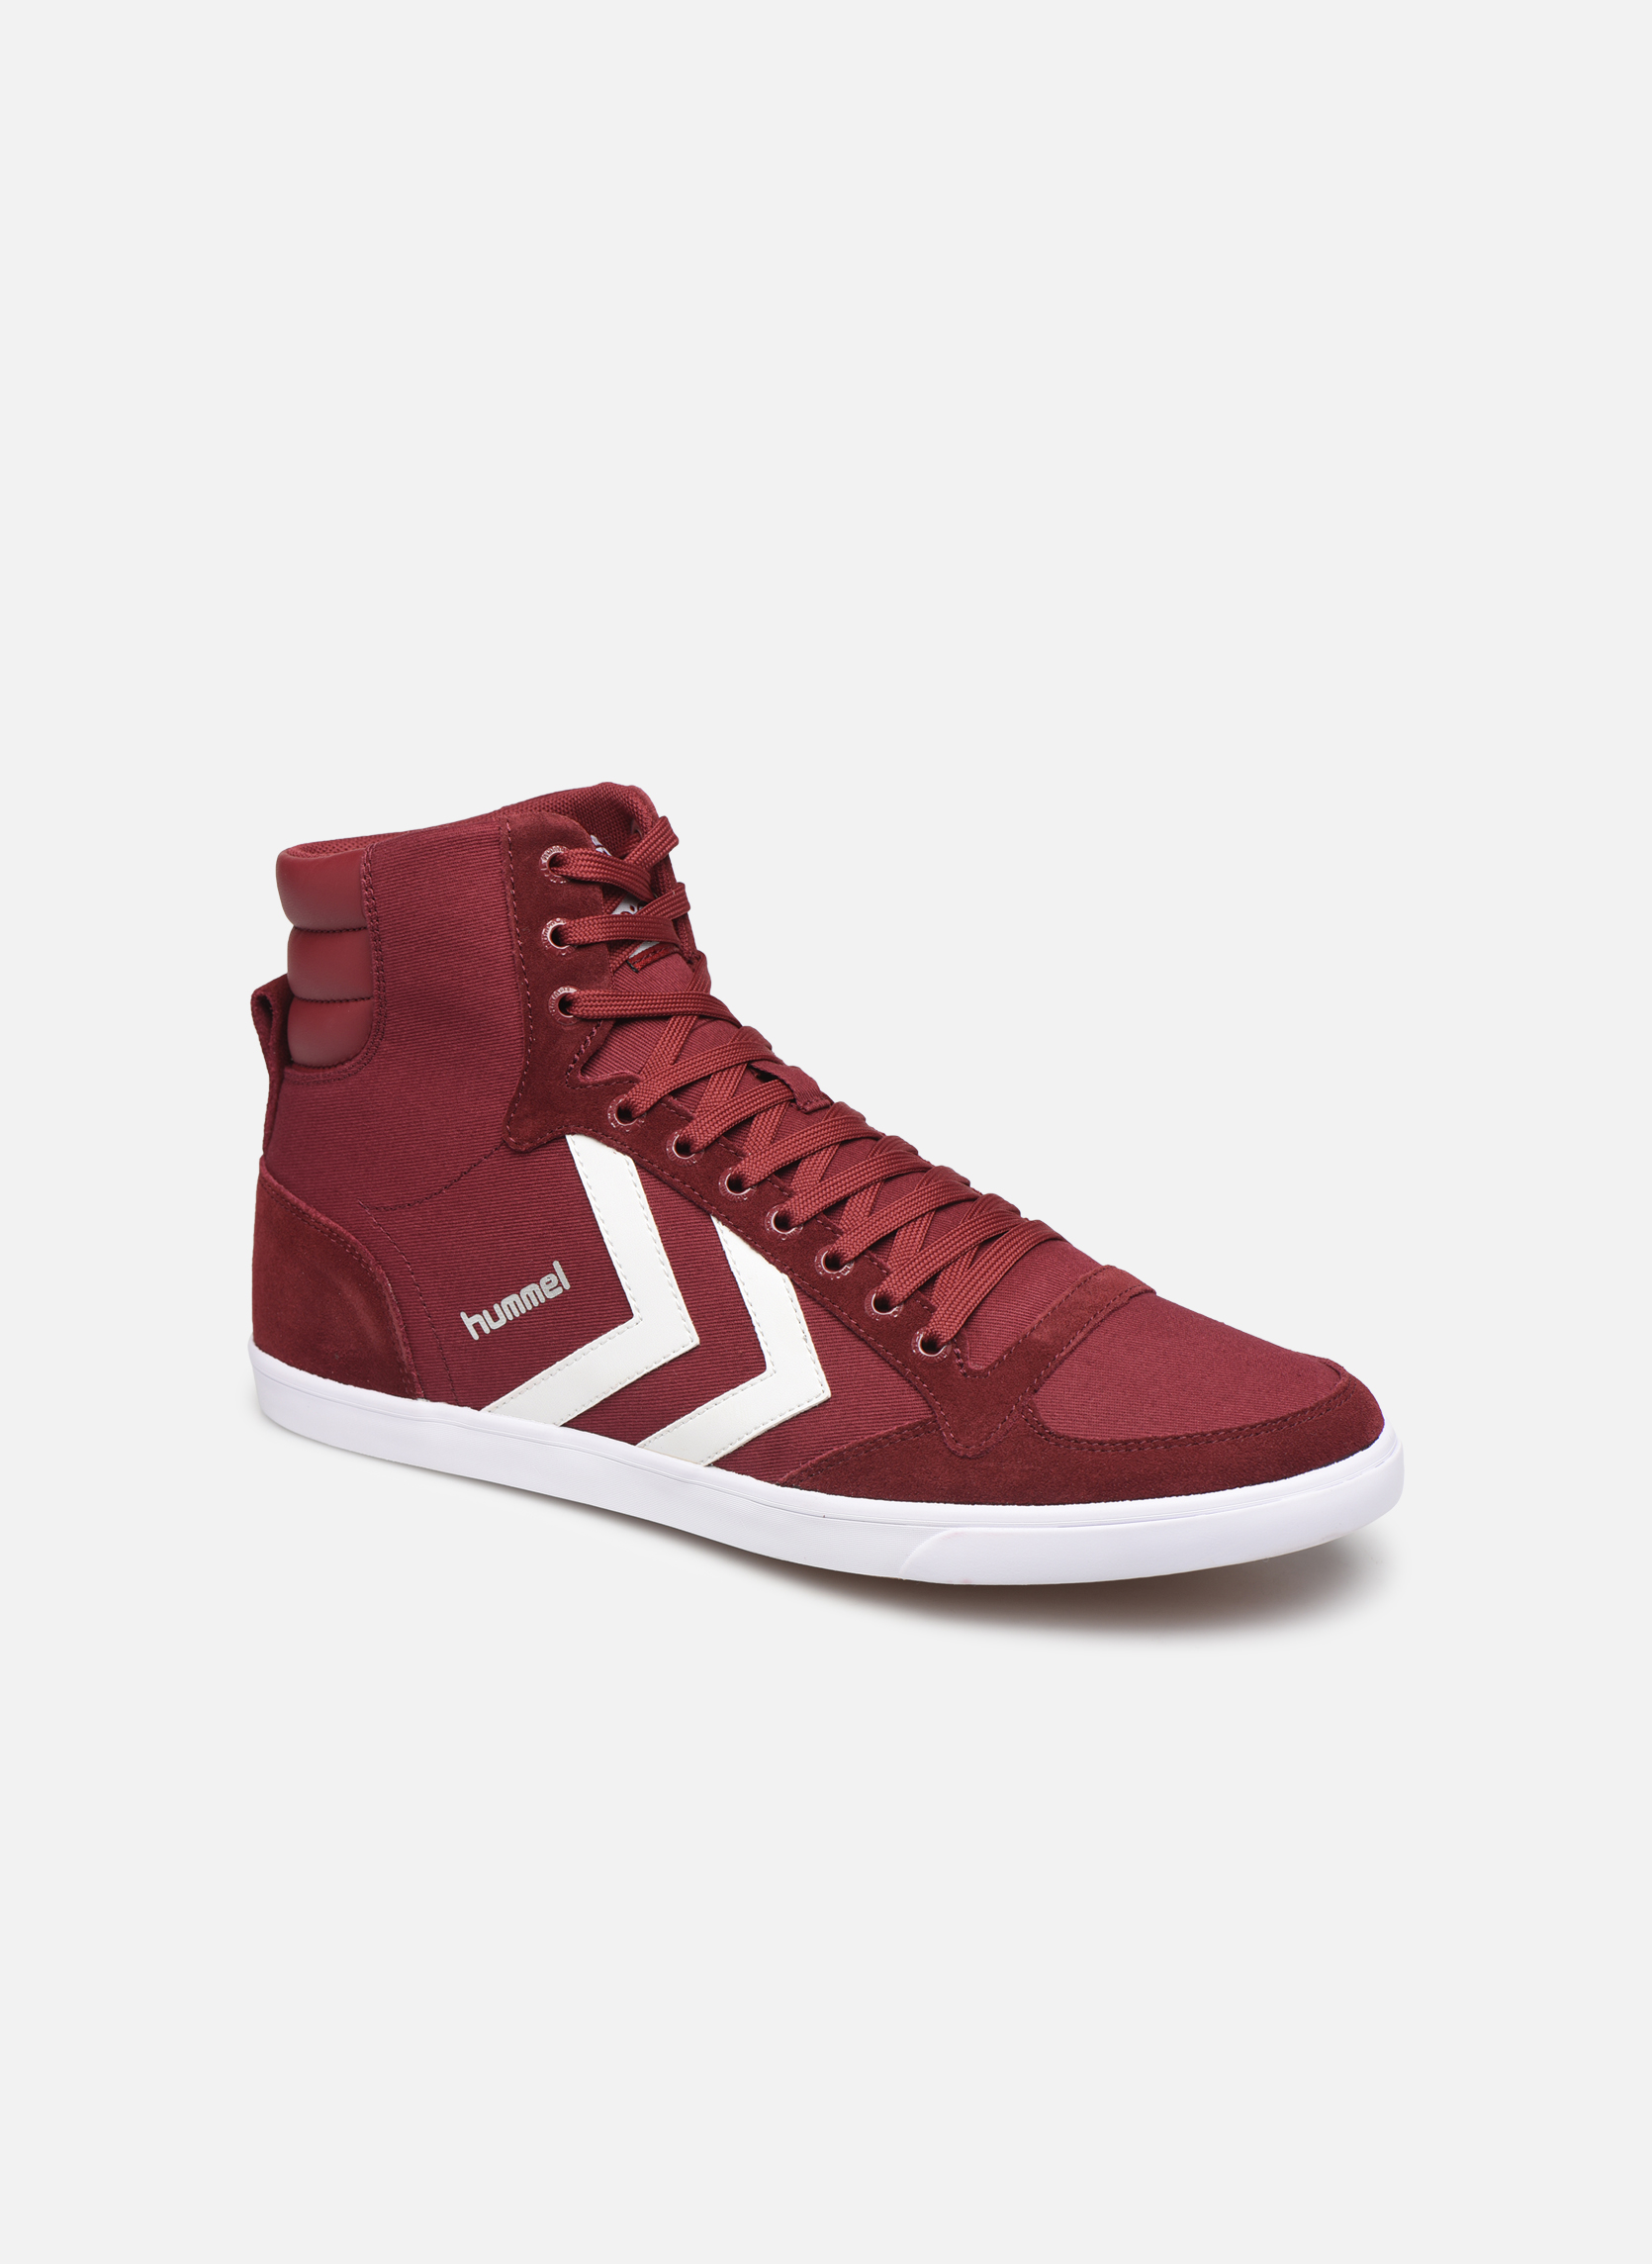 Sneakers Hummel Bordeaux